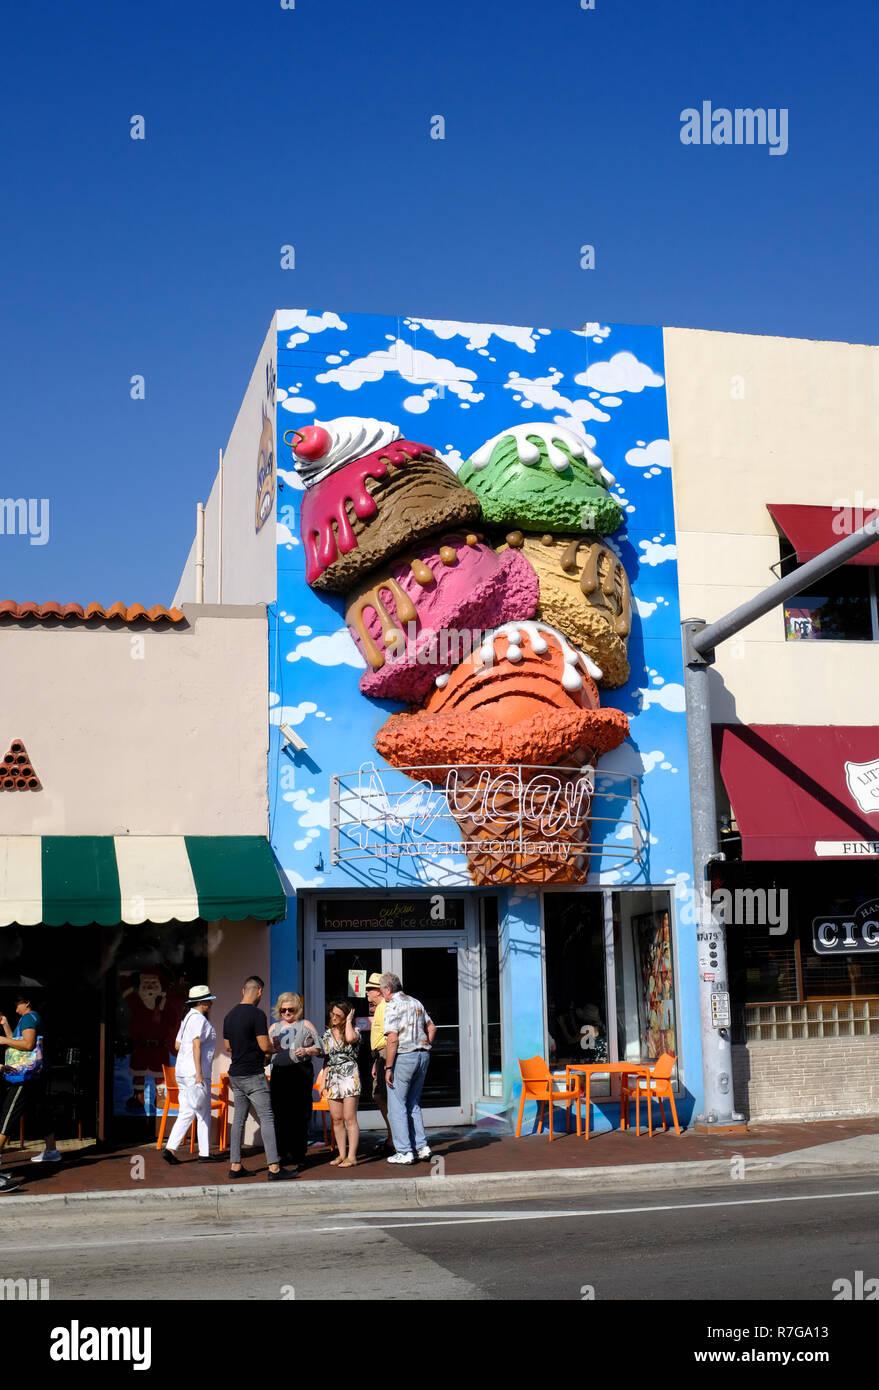 Azucar Ice Cream Parlor in Little Havana, Miami, Florida - Stock Image